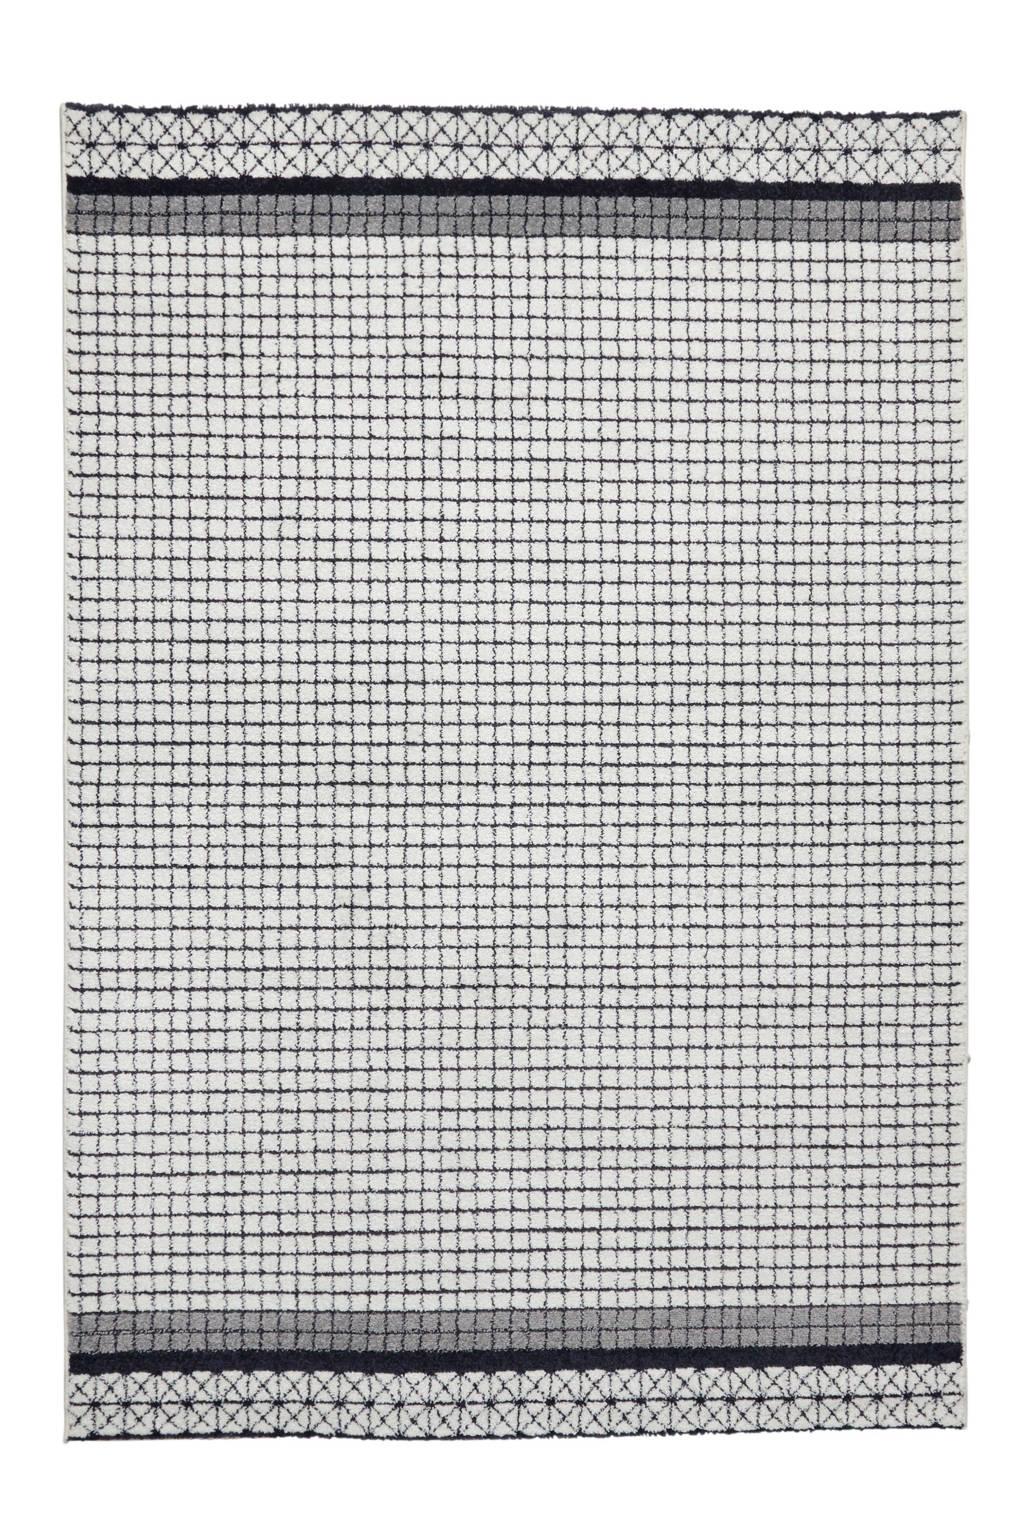 whkmp's own Vloerkleed  (230x160 cm), Donkerblauw/creme